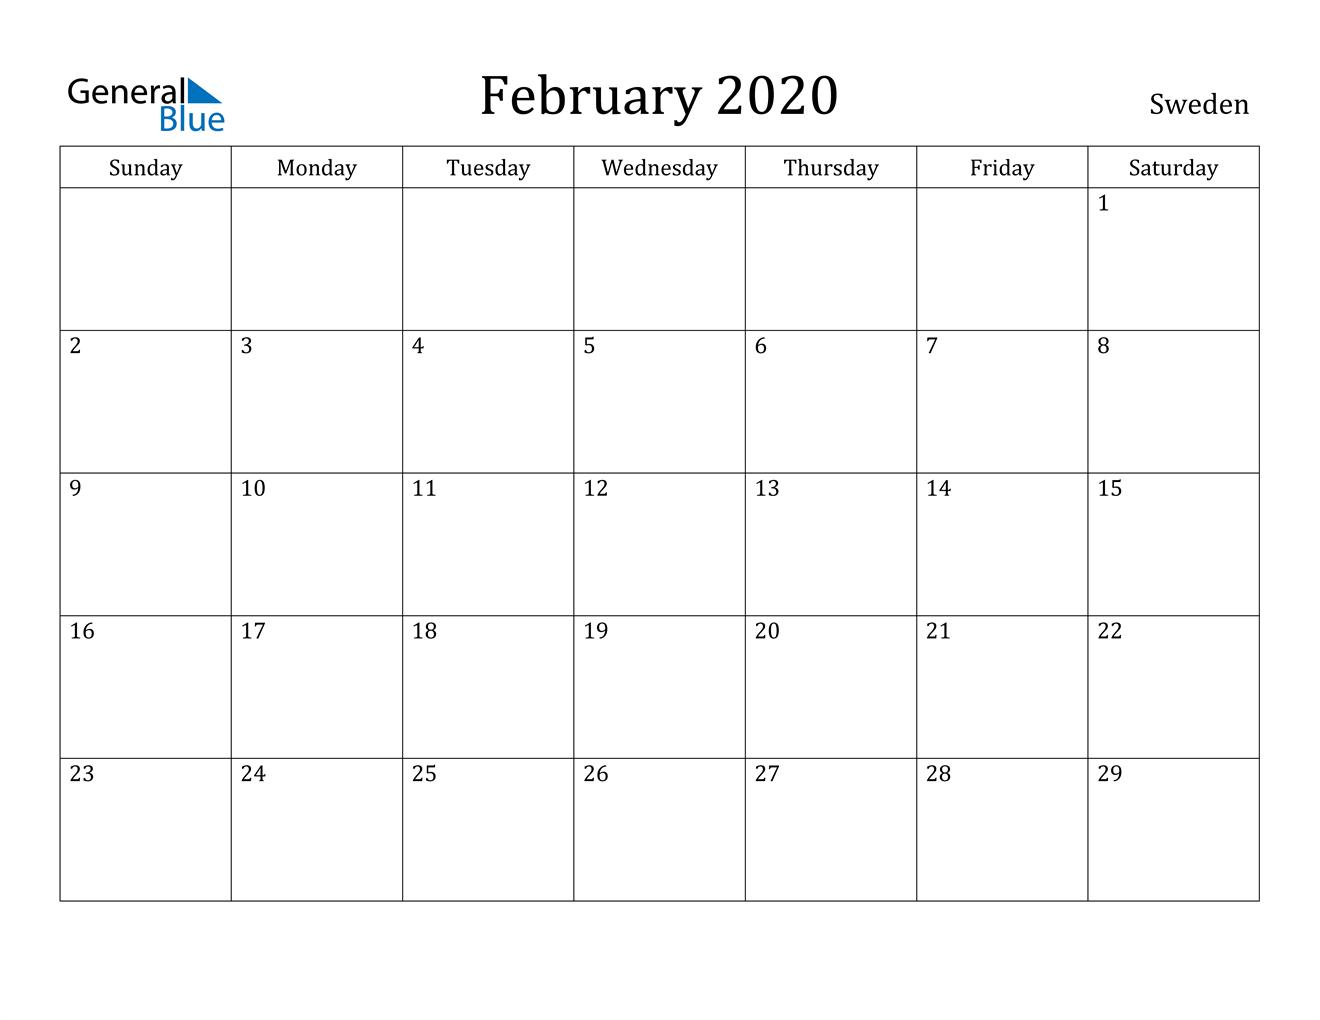 Image of February 2020 Sweden Calendar with Holidays Calendar